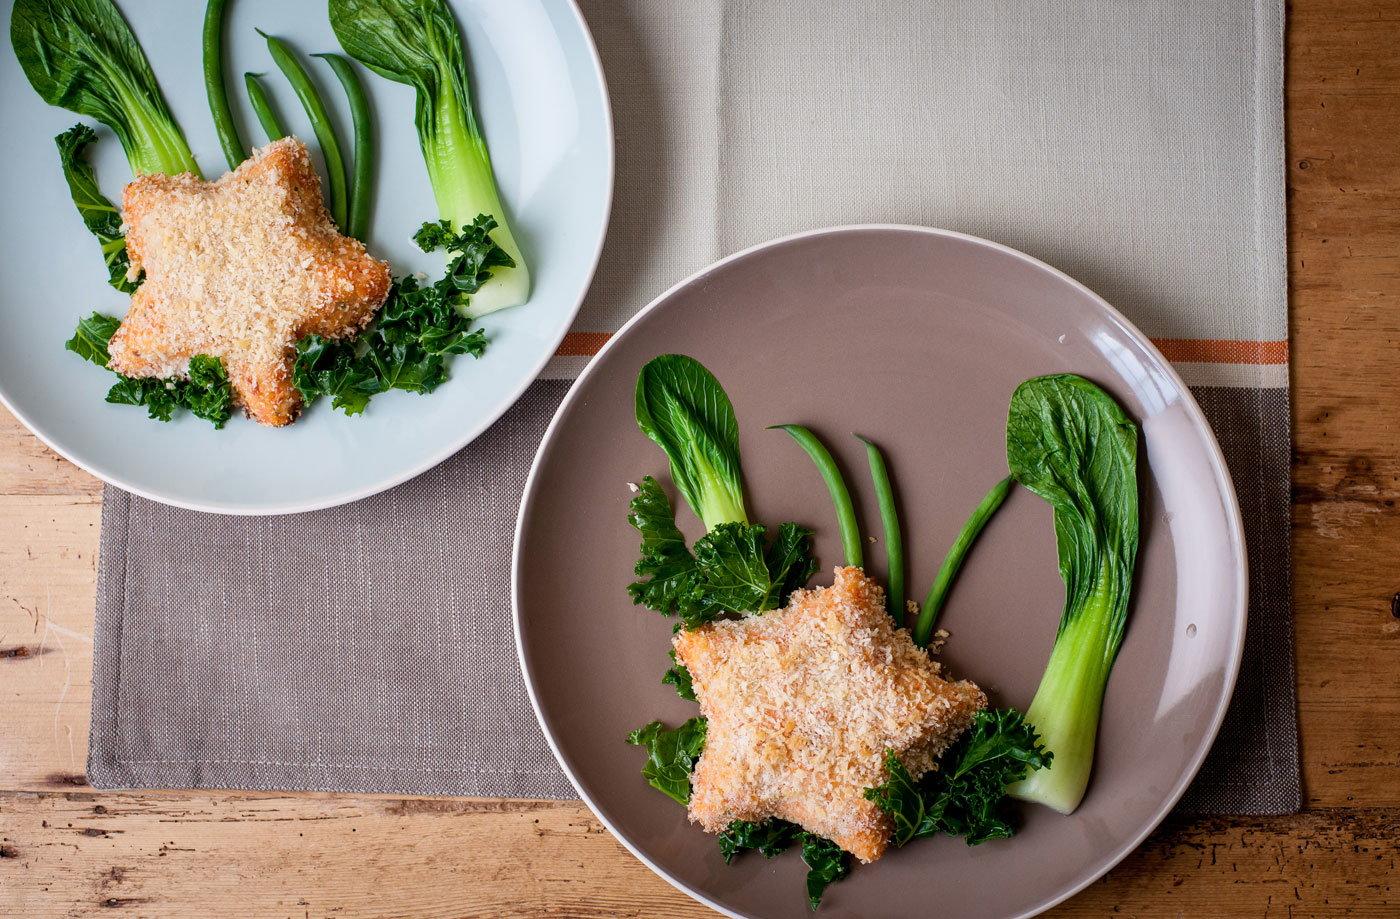 Tesco Cake Recipes Uk: Andy Waters' Star Fishcakes